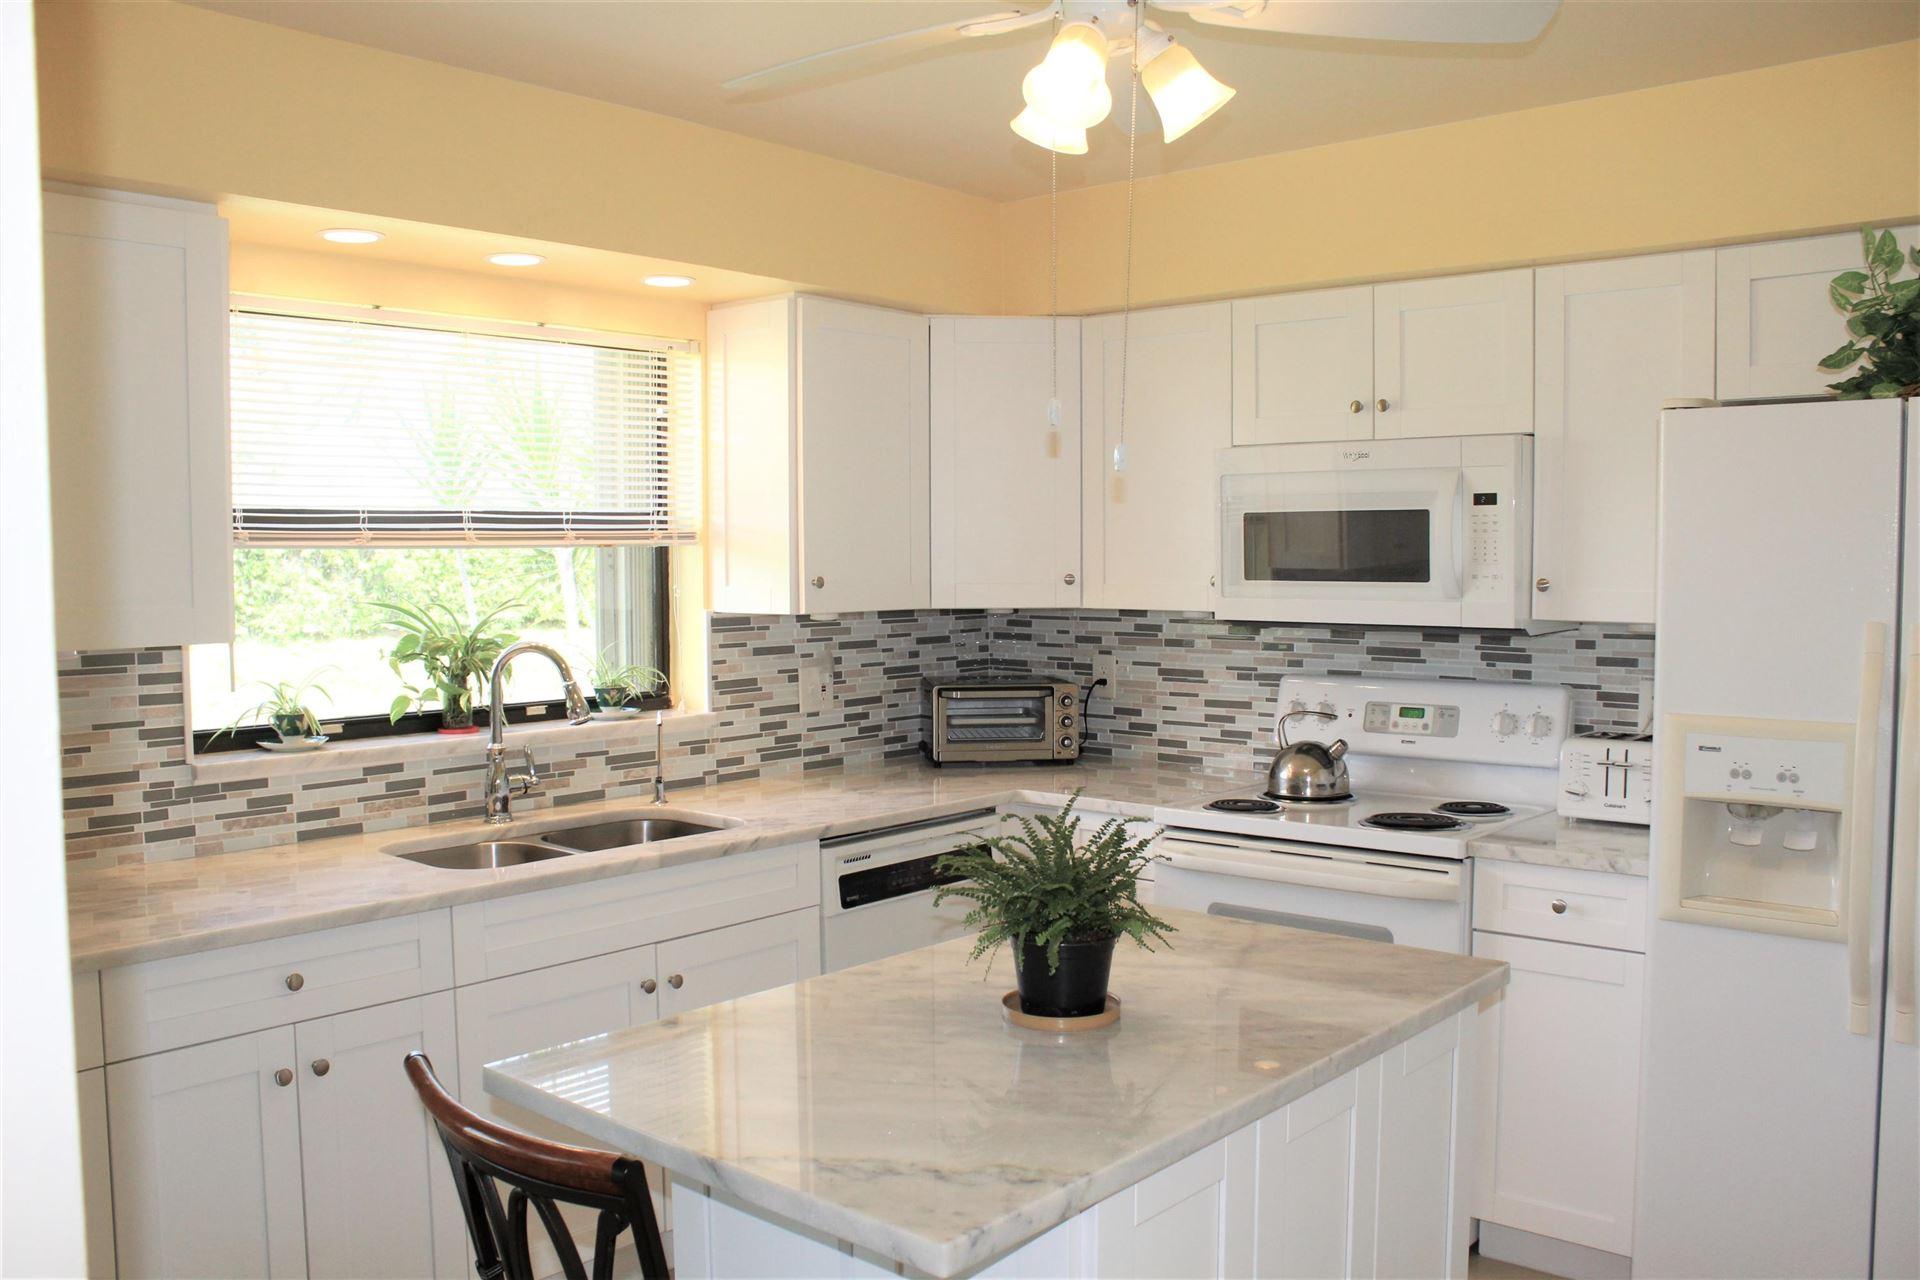 Photo of 4615 Laurel Tree Road #A, Boynton Beach, FL 33436 (MLS # RX-10657961)